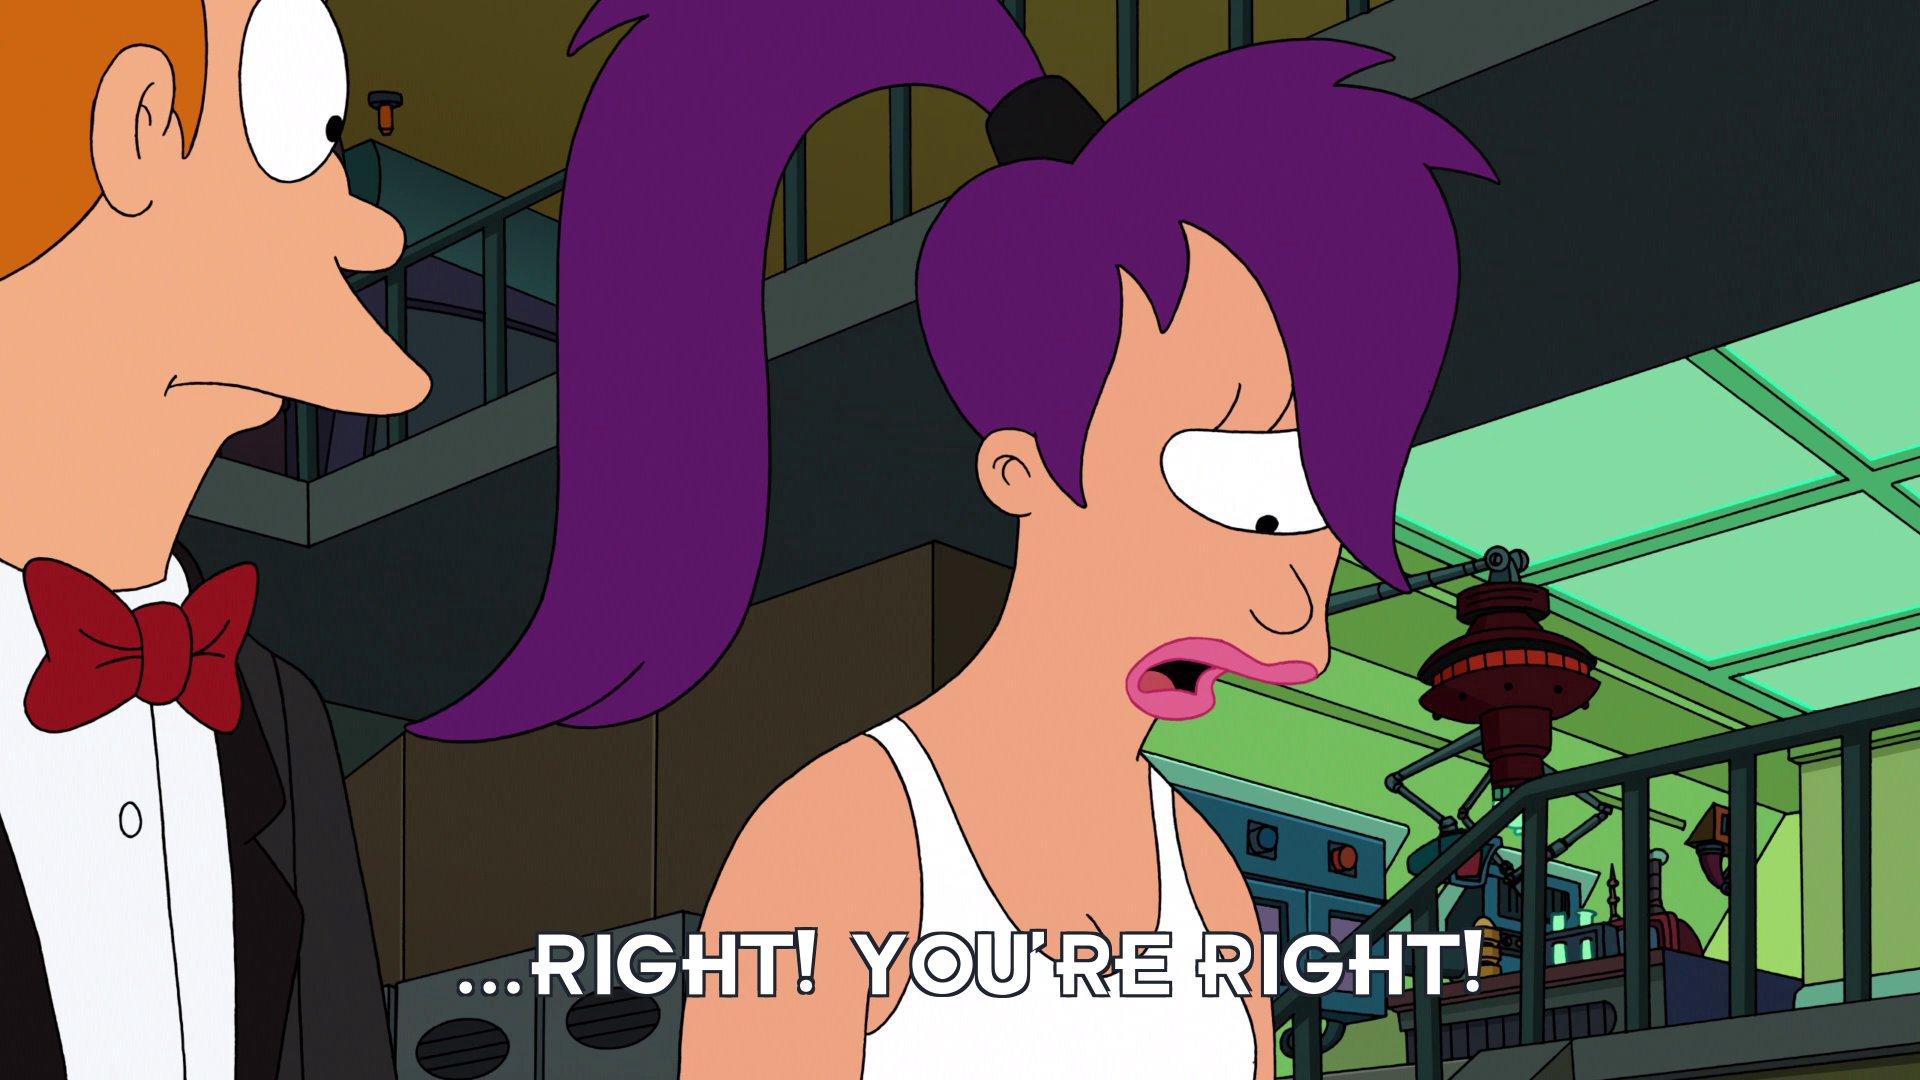 Turanga Leela: ...right! You're right!